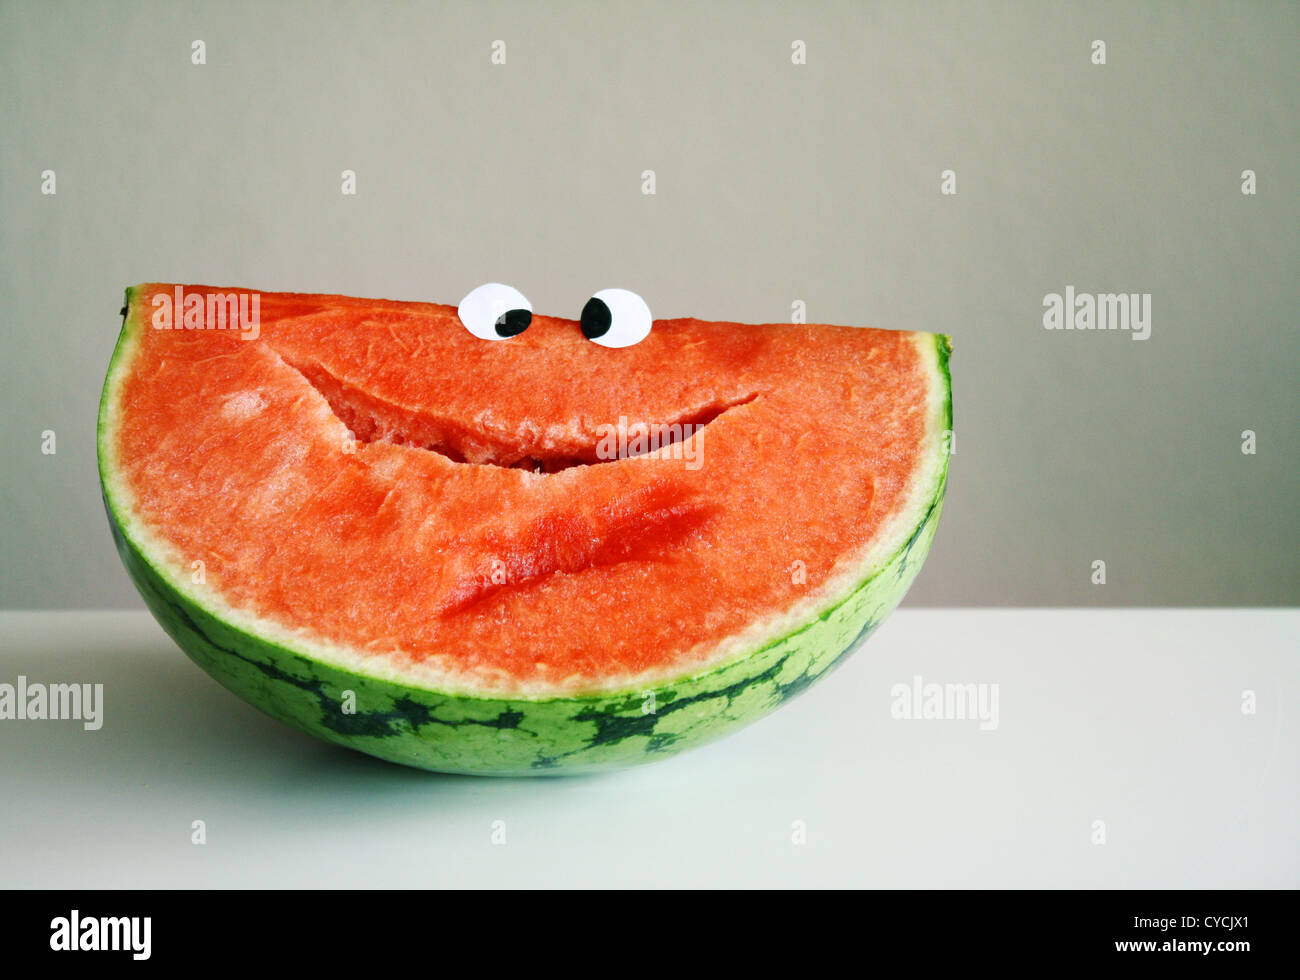 lächelnd, Obst, Wassermelone Stockbild